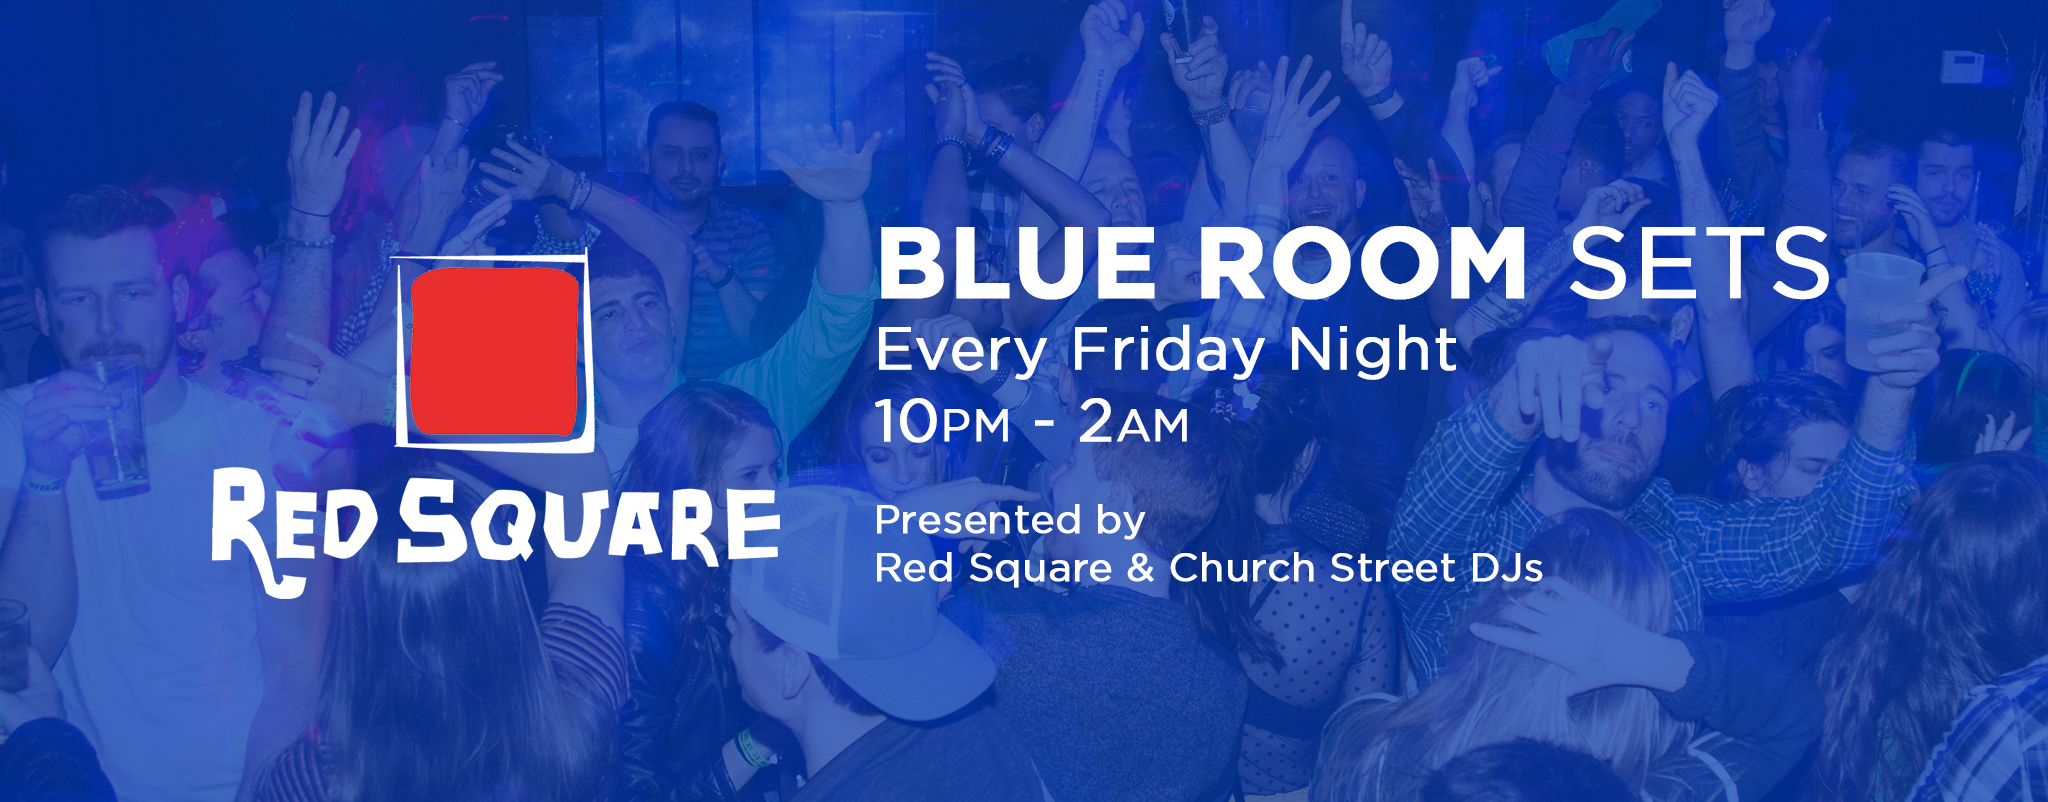 BLUE ROOM SETS CRAIC COVER.jpg